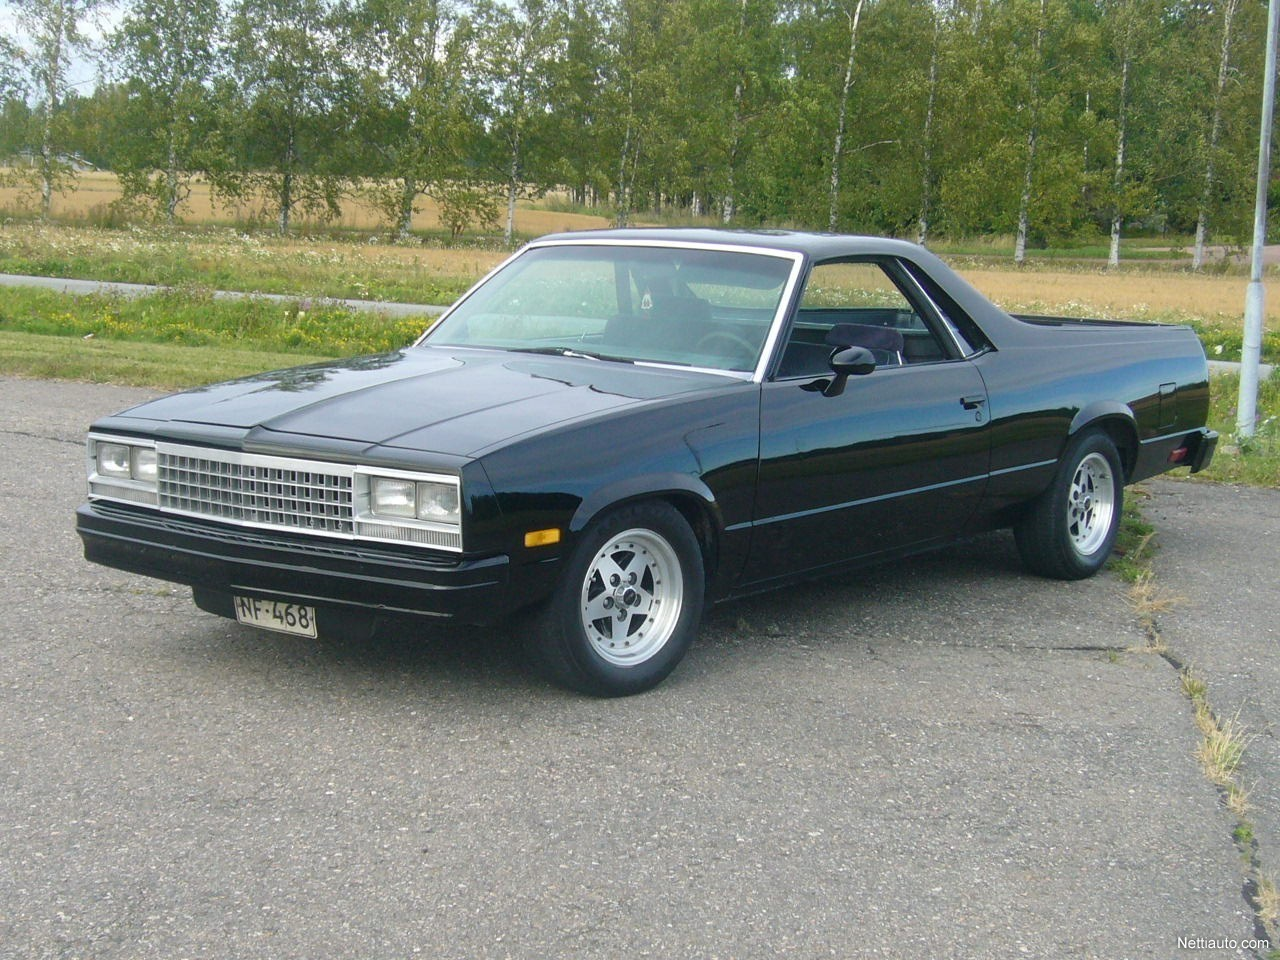 Chevrolet El Camino leimaa 8/2019 asti Pickup 1984 - Used ...